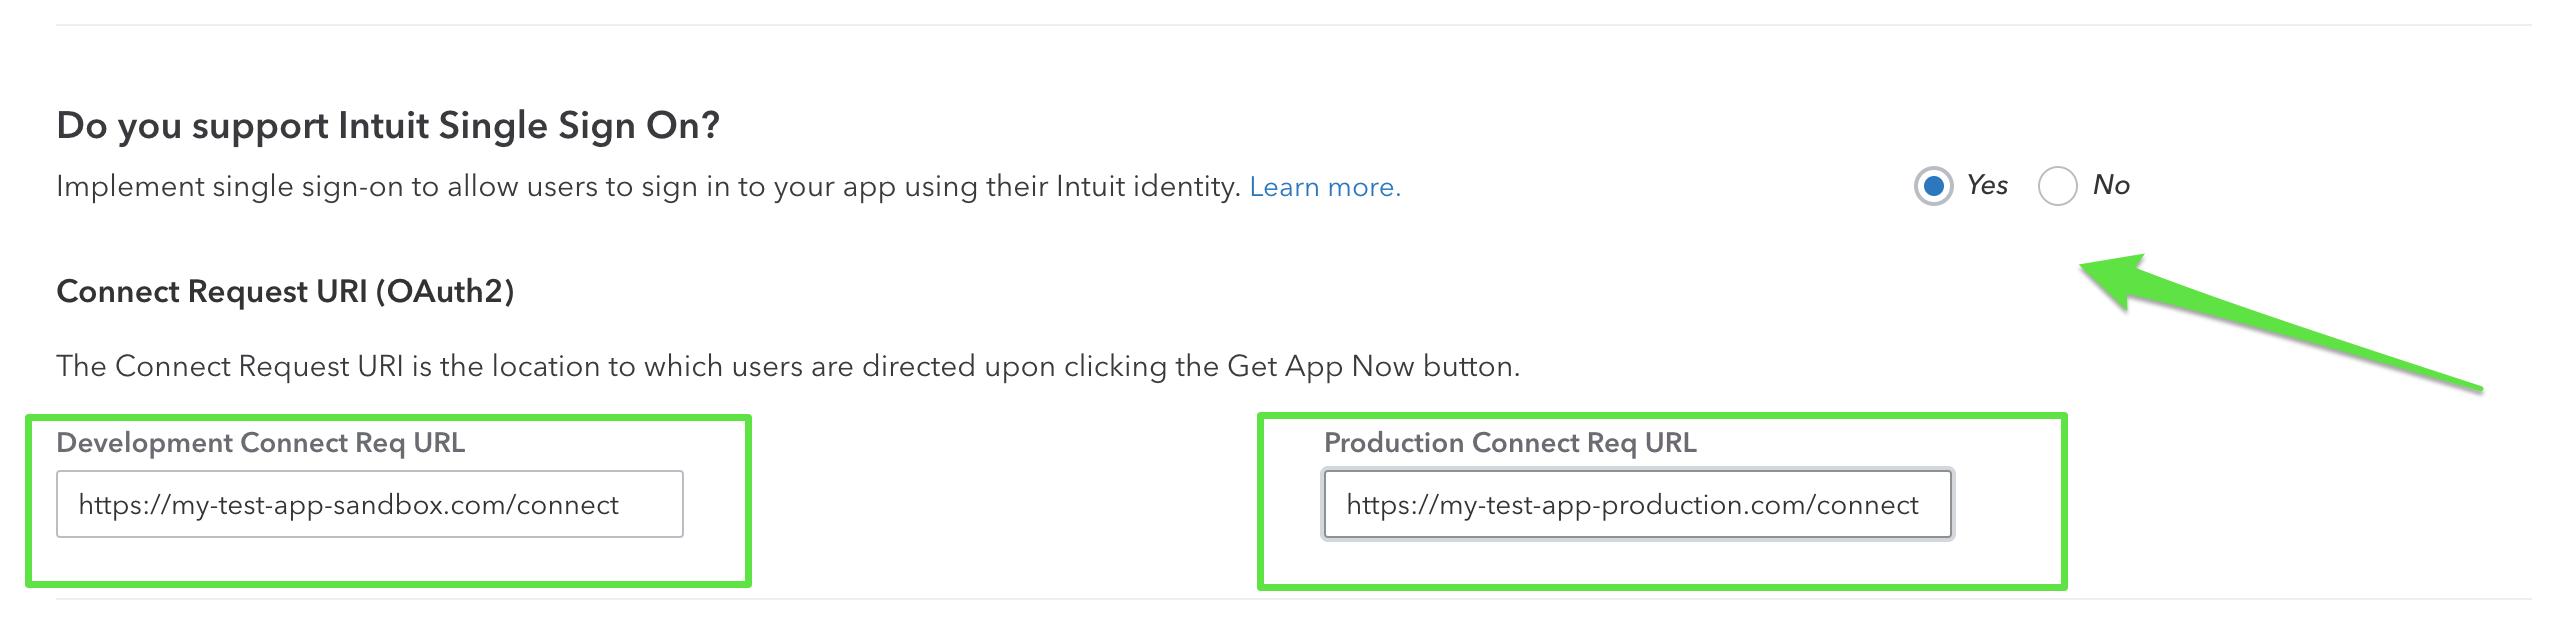 qbo/docs/list-on-the-app-store/app_settings_sso.png